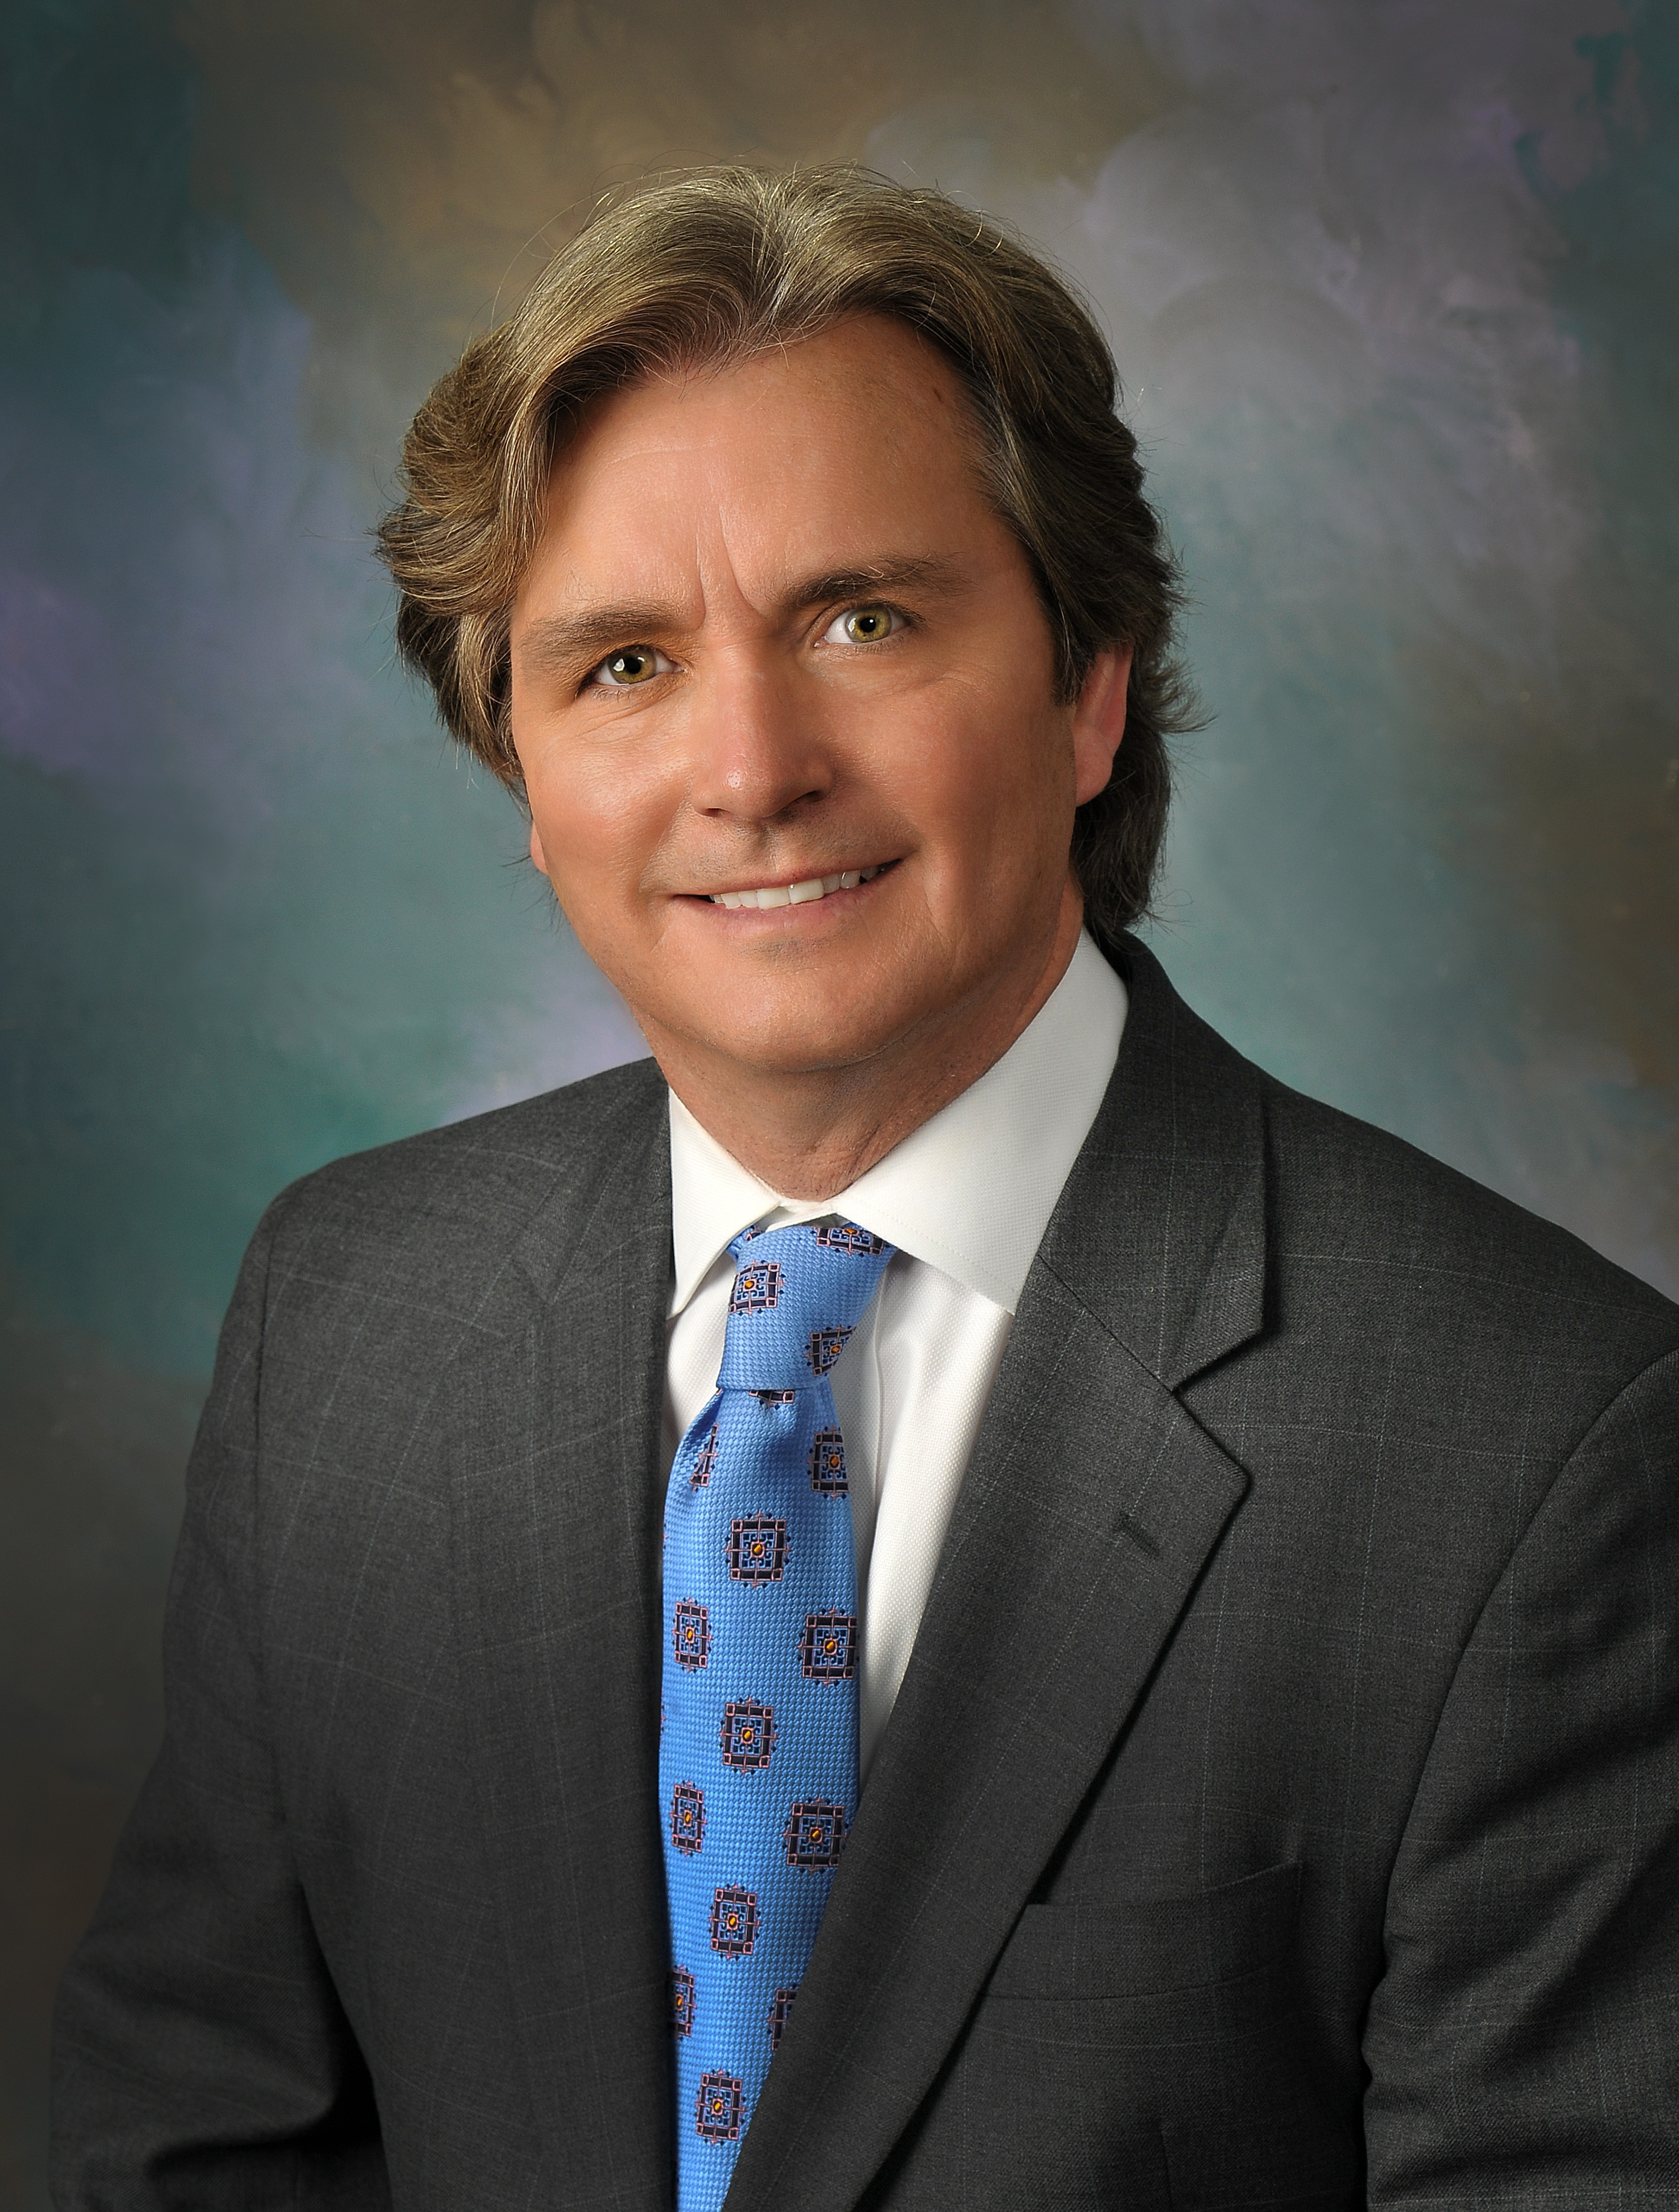 J. Victor Flanagan